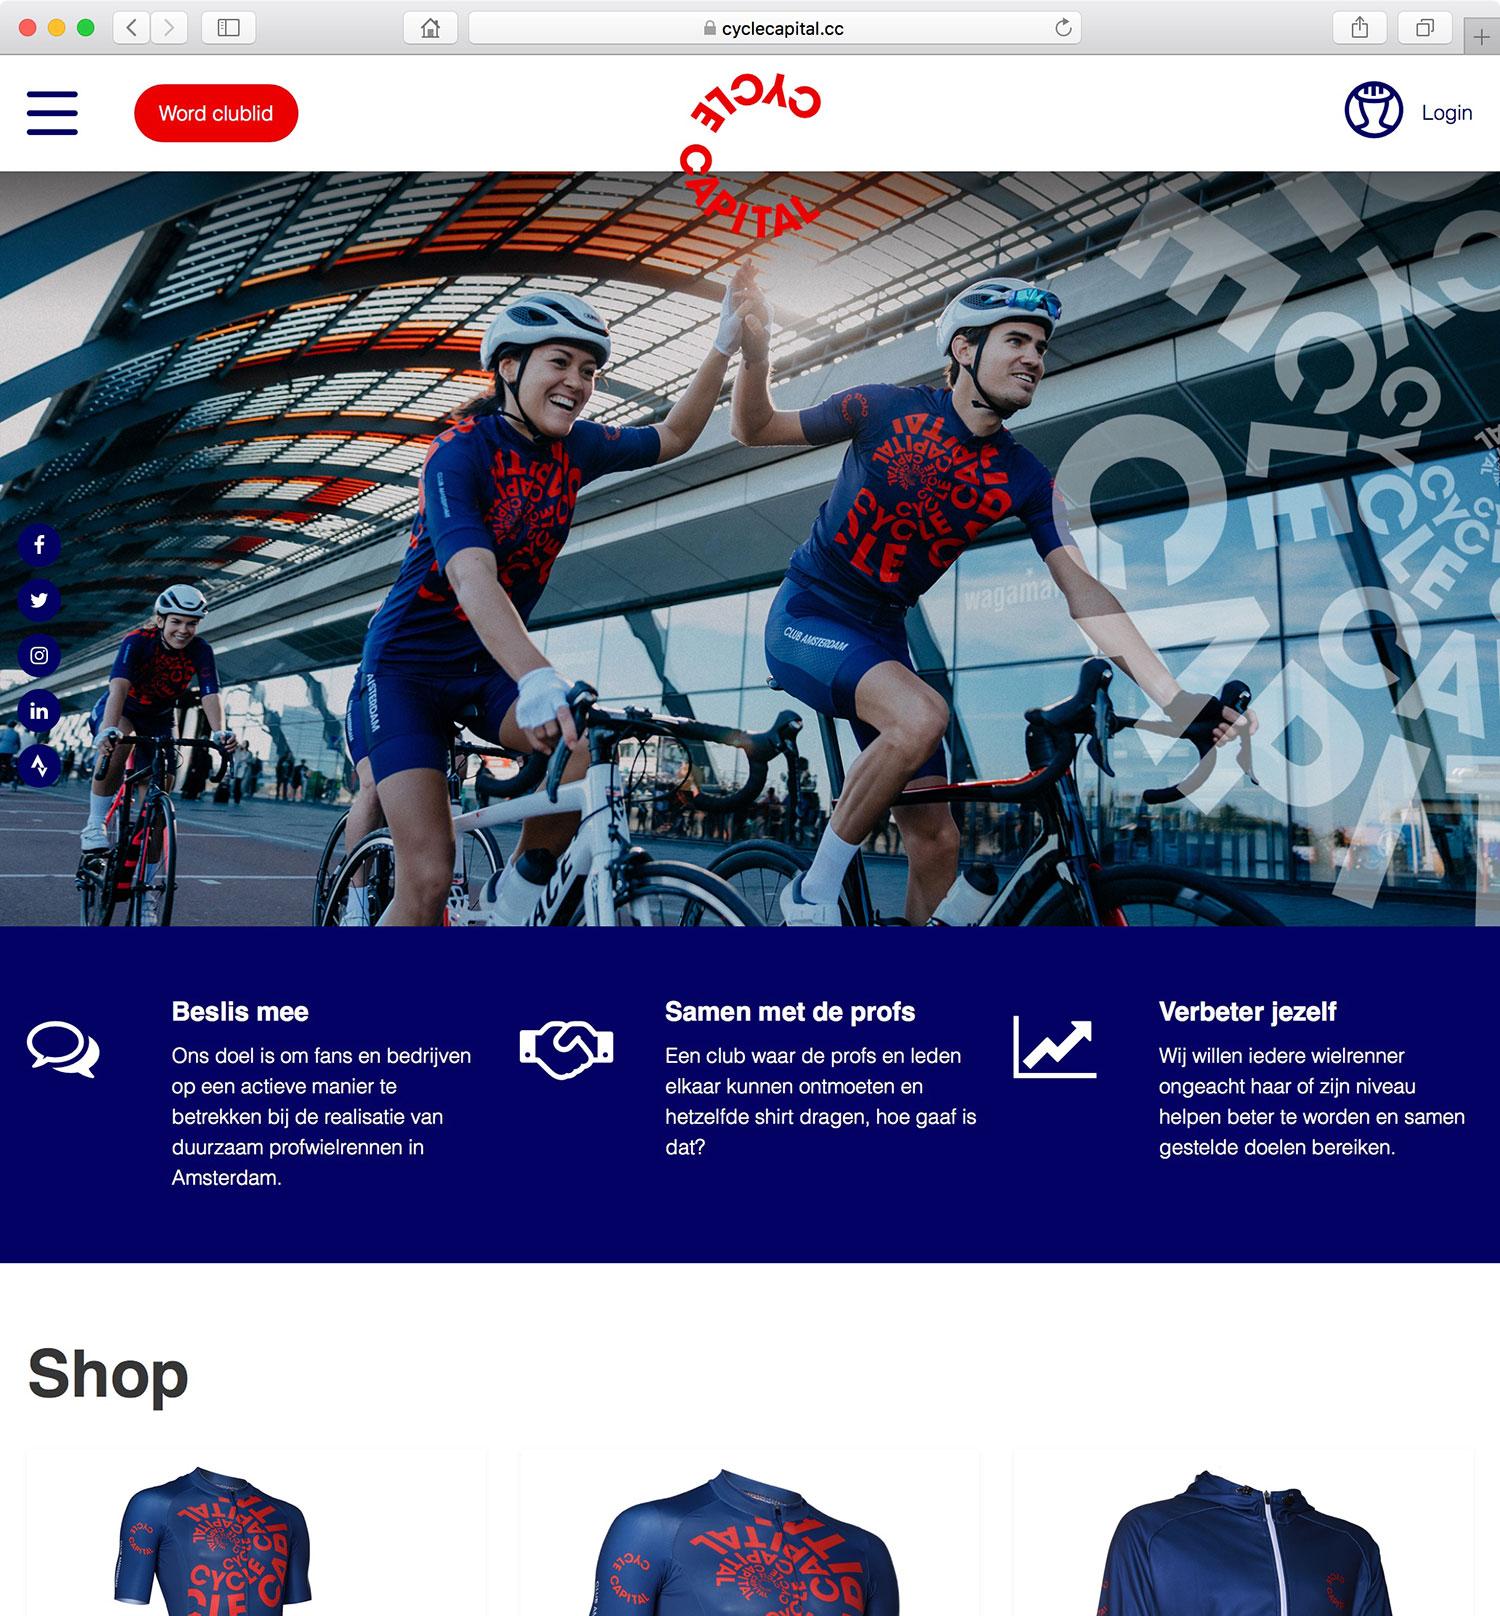 Startpagina van de Amsterdamse wielerclub Cycle Capital